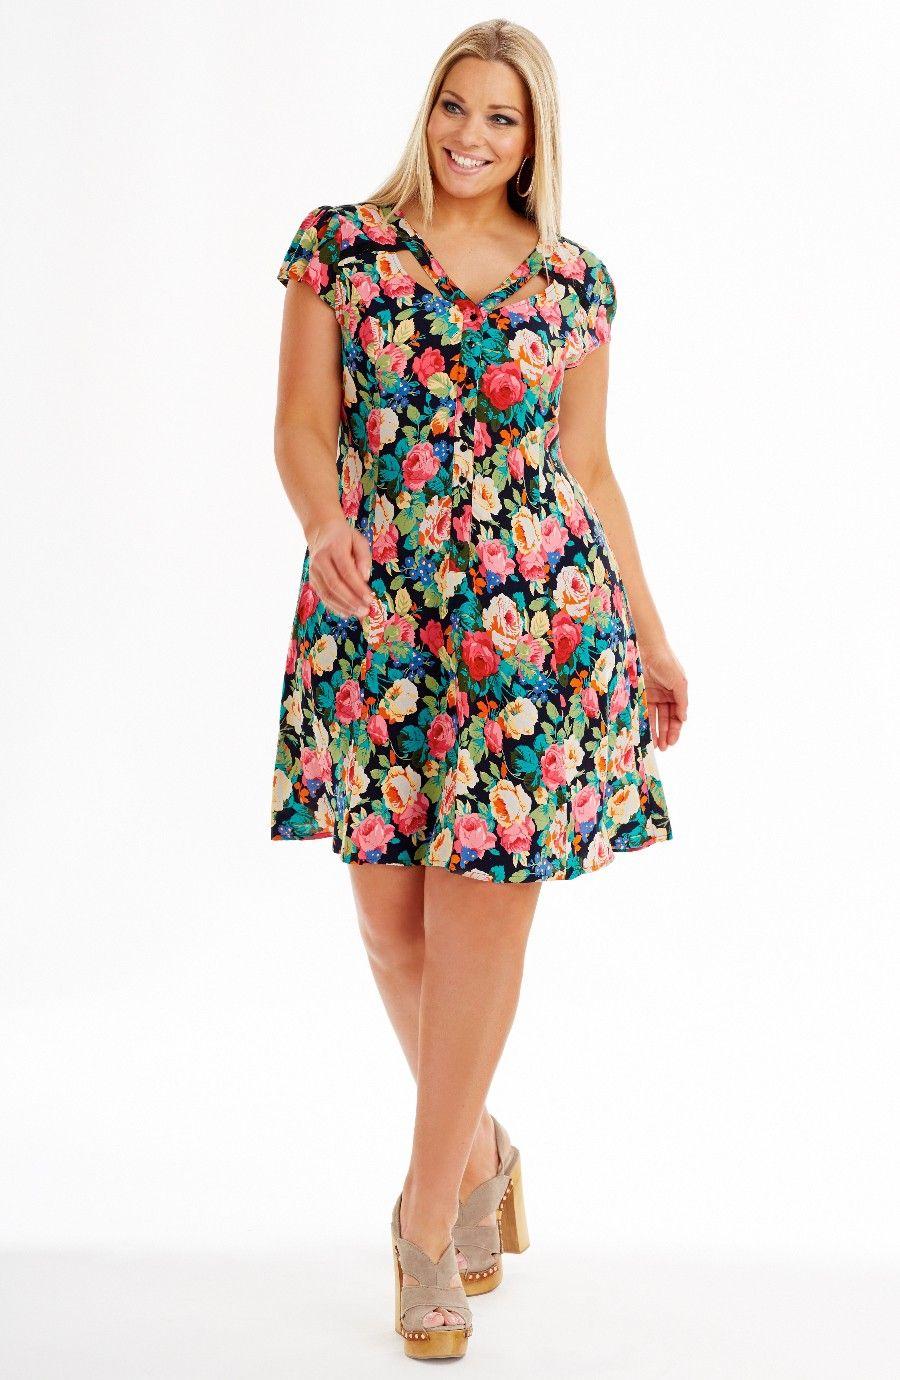 Plus size clothing fashion for women - avenue